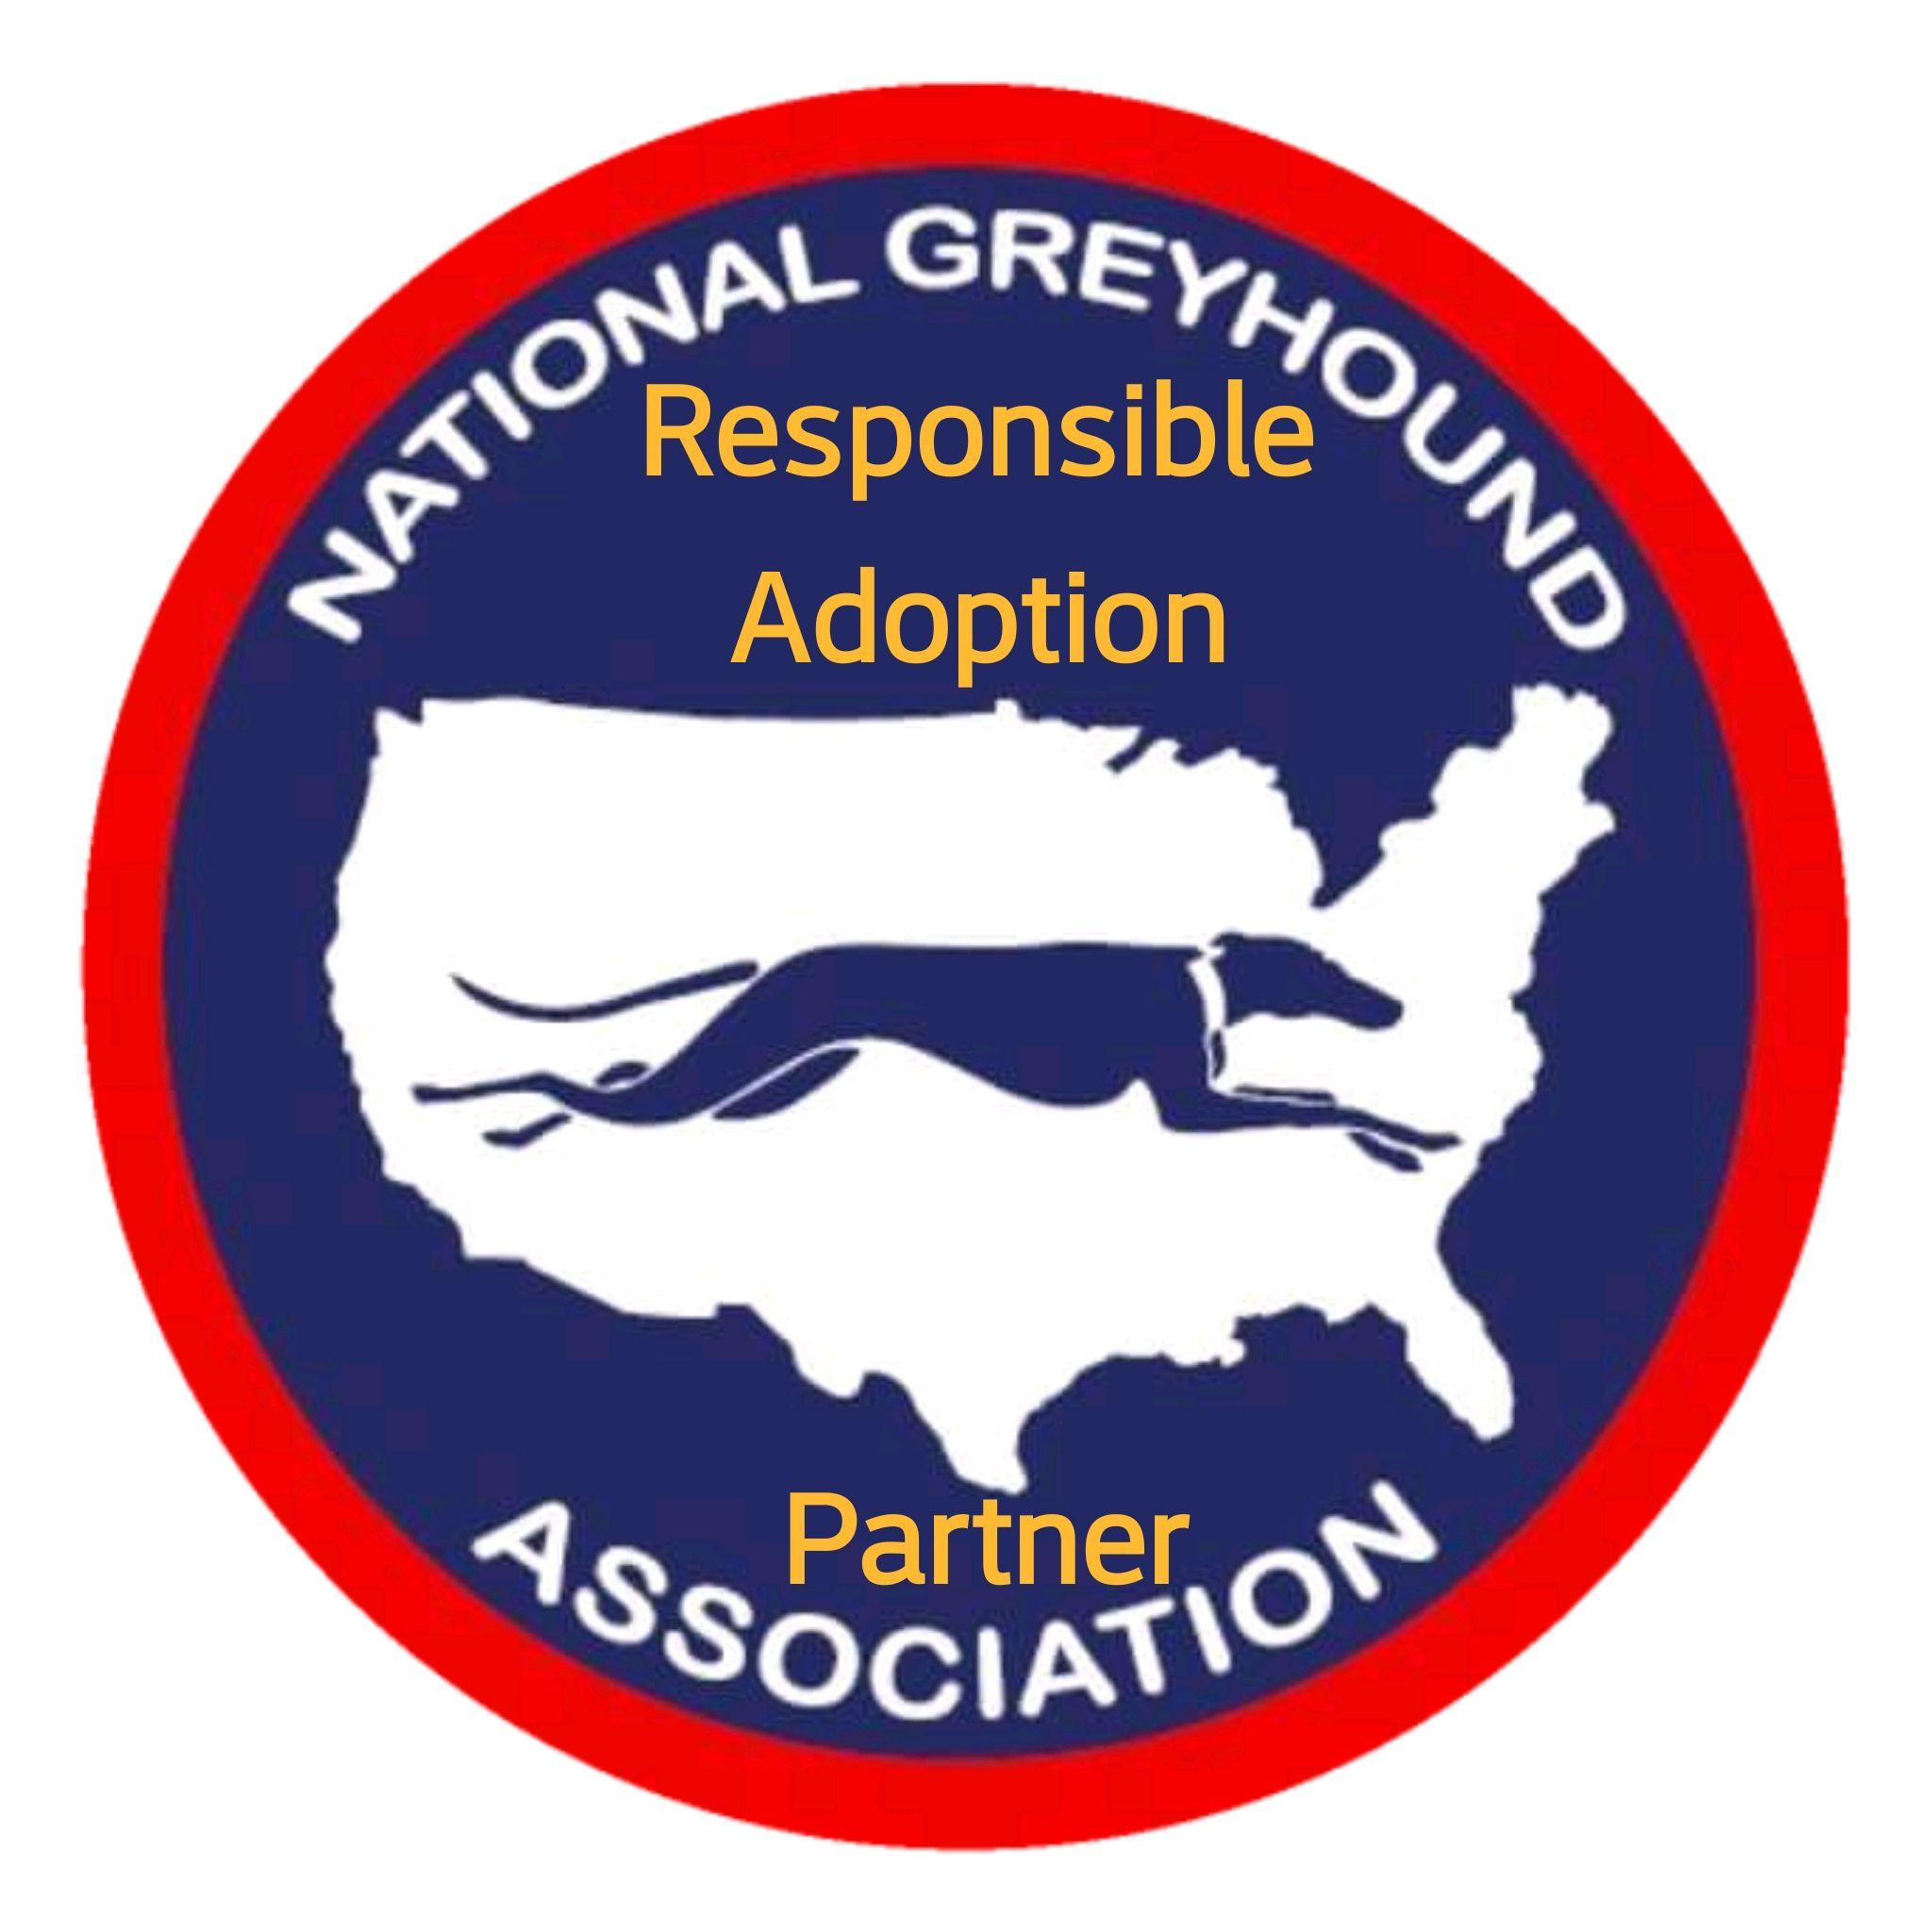 - We are an NGA Endorsed Responsible Adoption Group